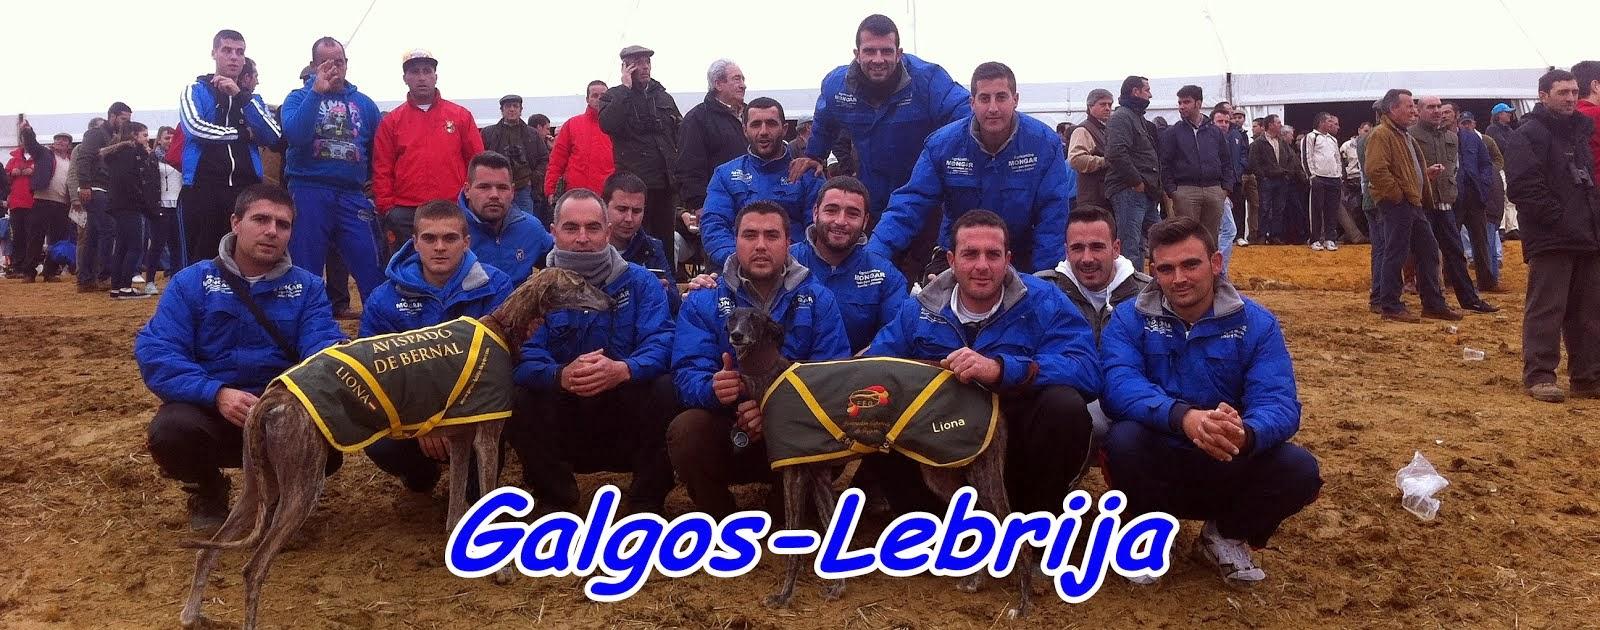 GALGOS LEBRIJA